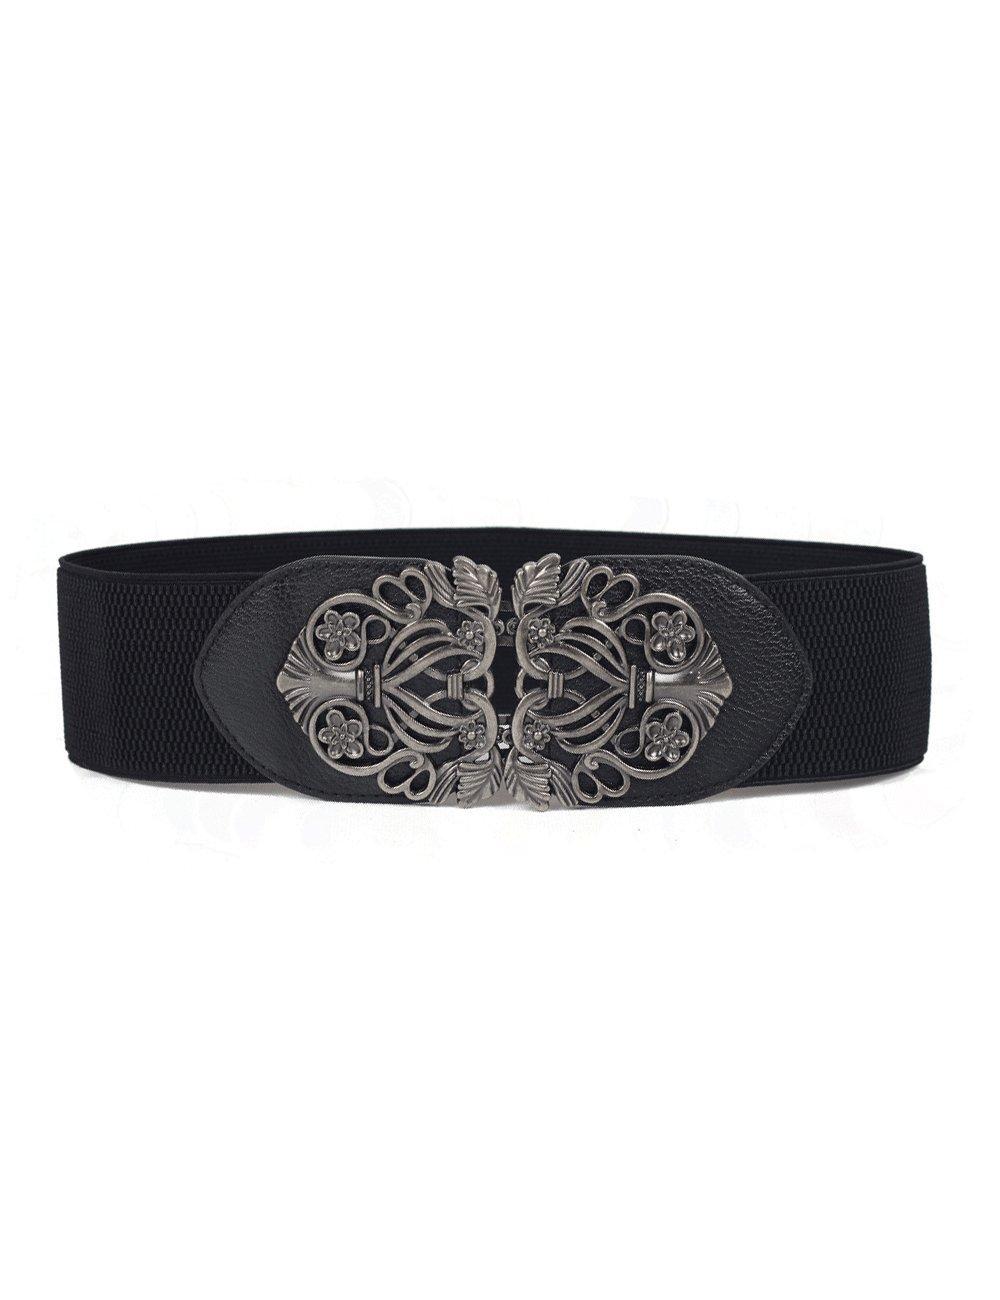 Chicwe Women's Vintage Plus Size Waist Belt Elastic Stretch Silver 110 CM C17B010B02